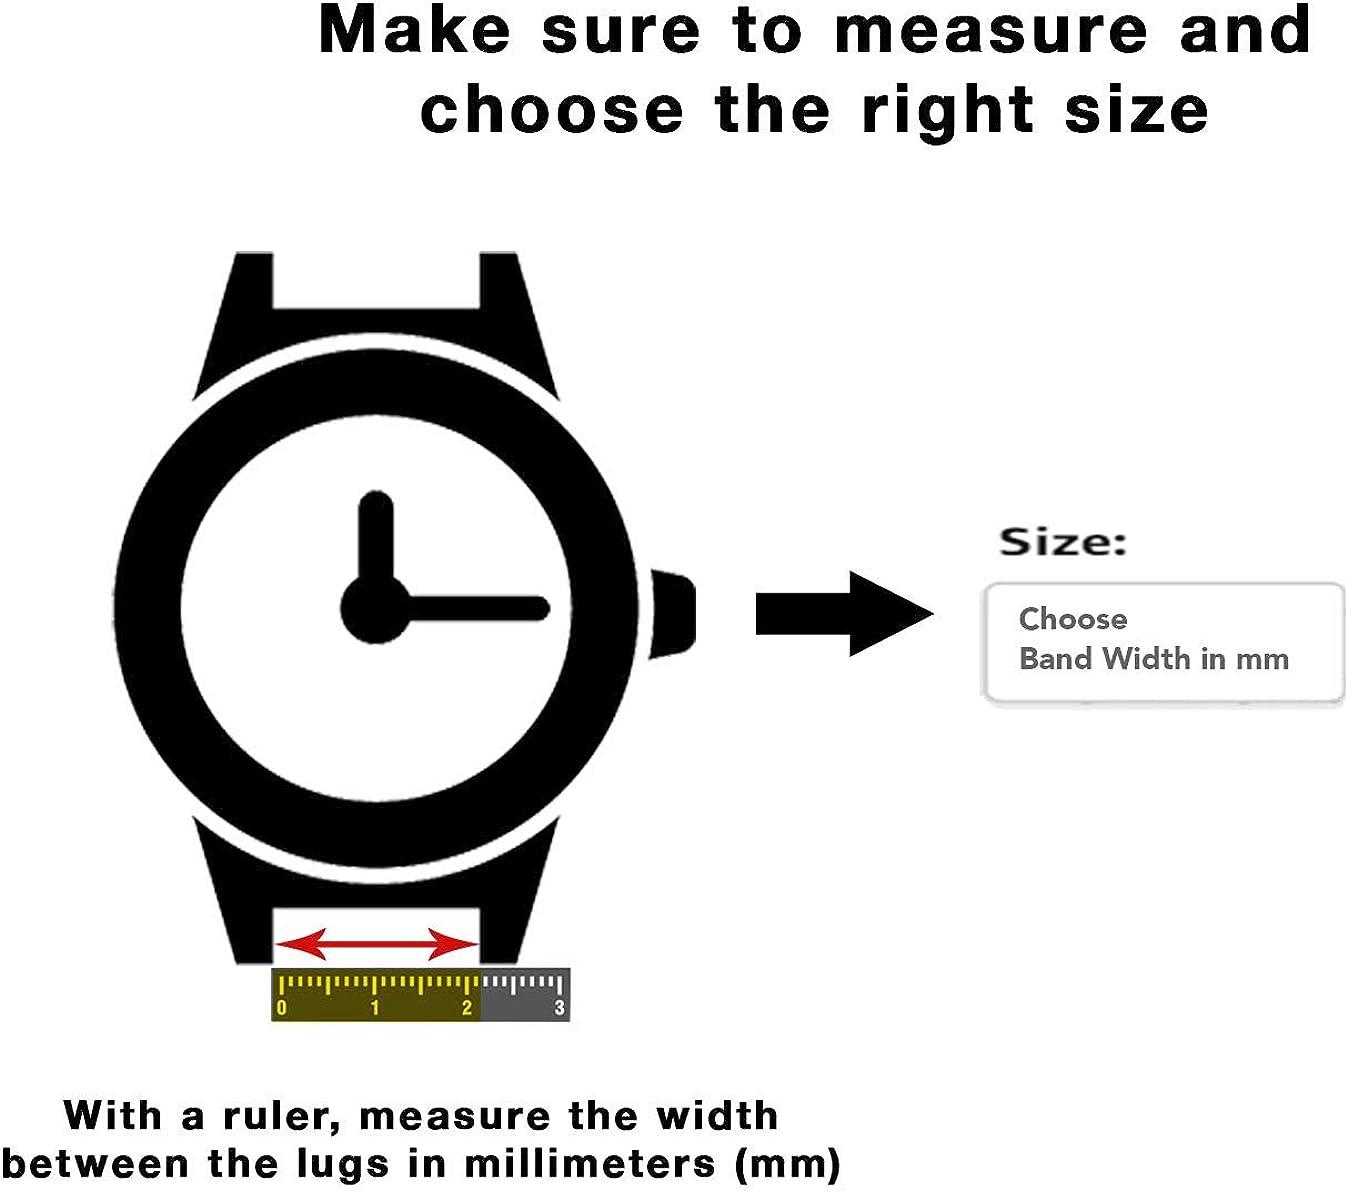 12mm - 20mm Leder Uhrenarmband Für Damen, Alligatormuster, Weiß, Blau, Rot, Orange, Rosa, Dunkelgrün Hellbraun / Goldene Schnalle